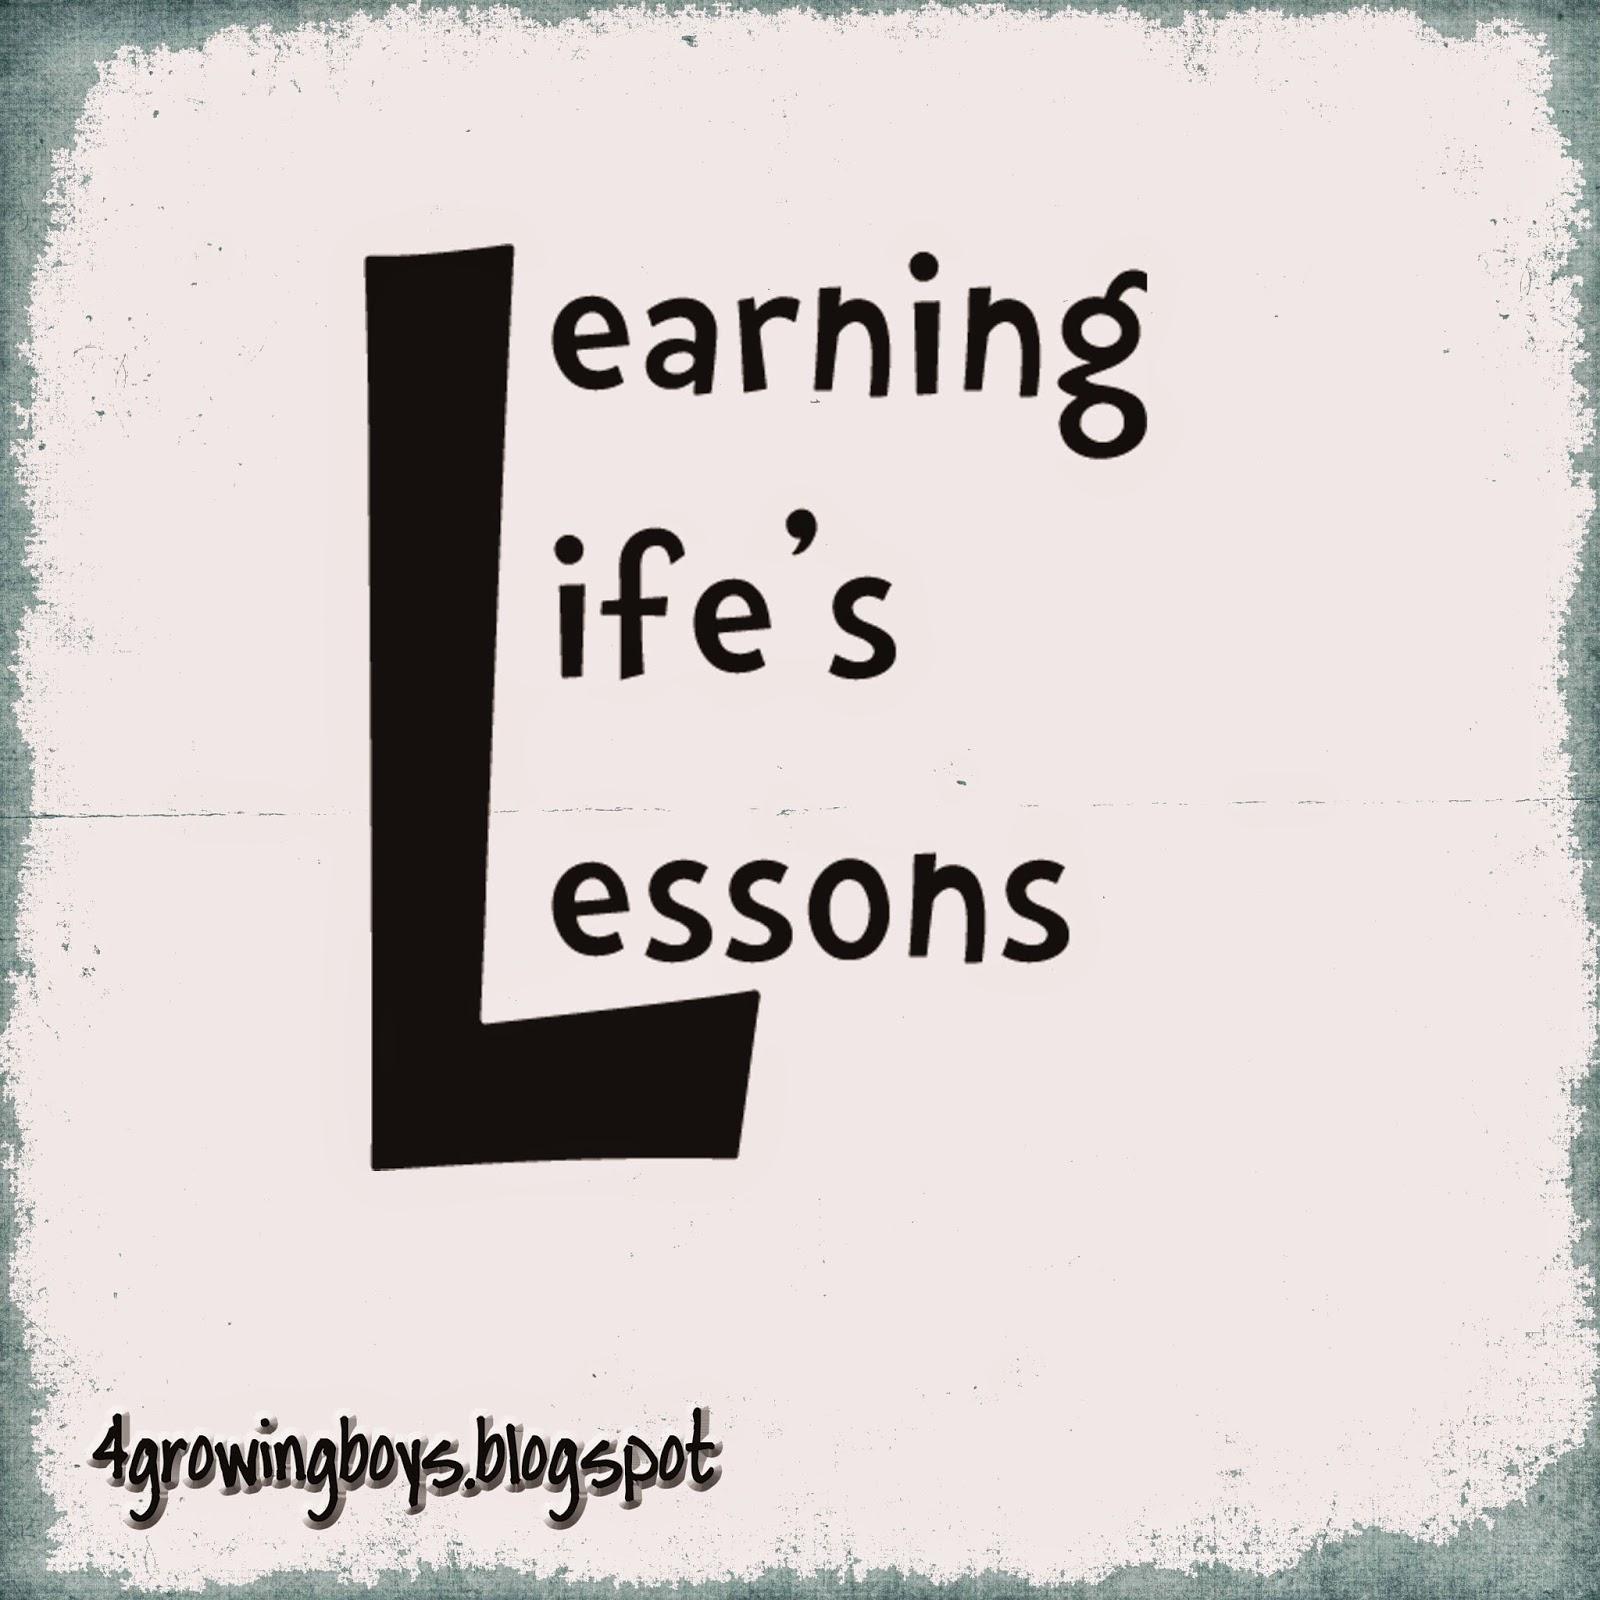 http://3.bp.blogspot.com/-VUAesoJLhng/VPy-vTRcSlI/AAAAAAAALOU/FE5BuNOZT0w/s1600/Learning%2BLife's%2BLessons.jpg